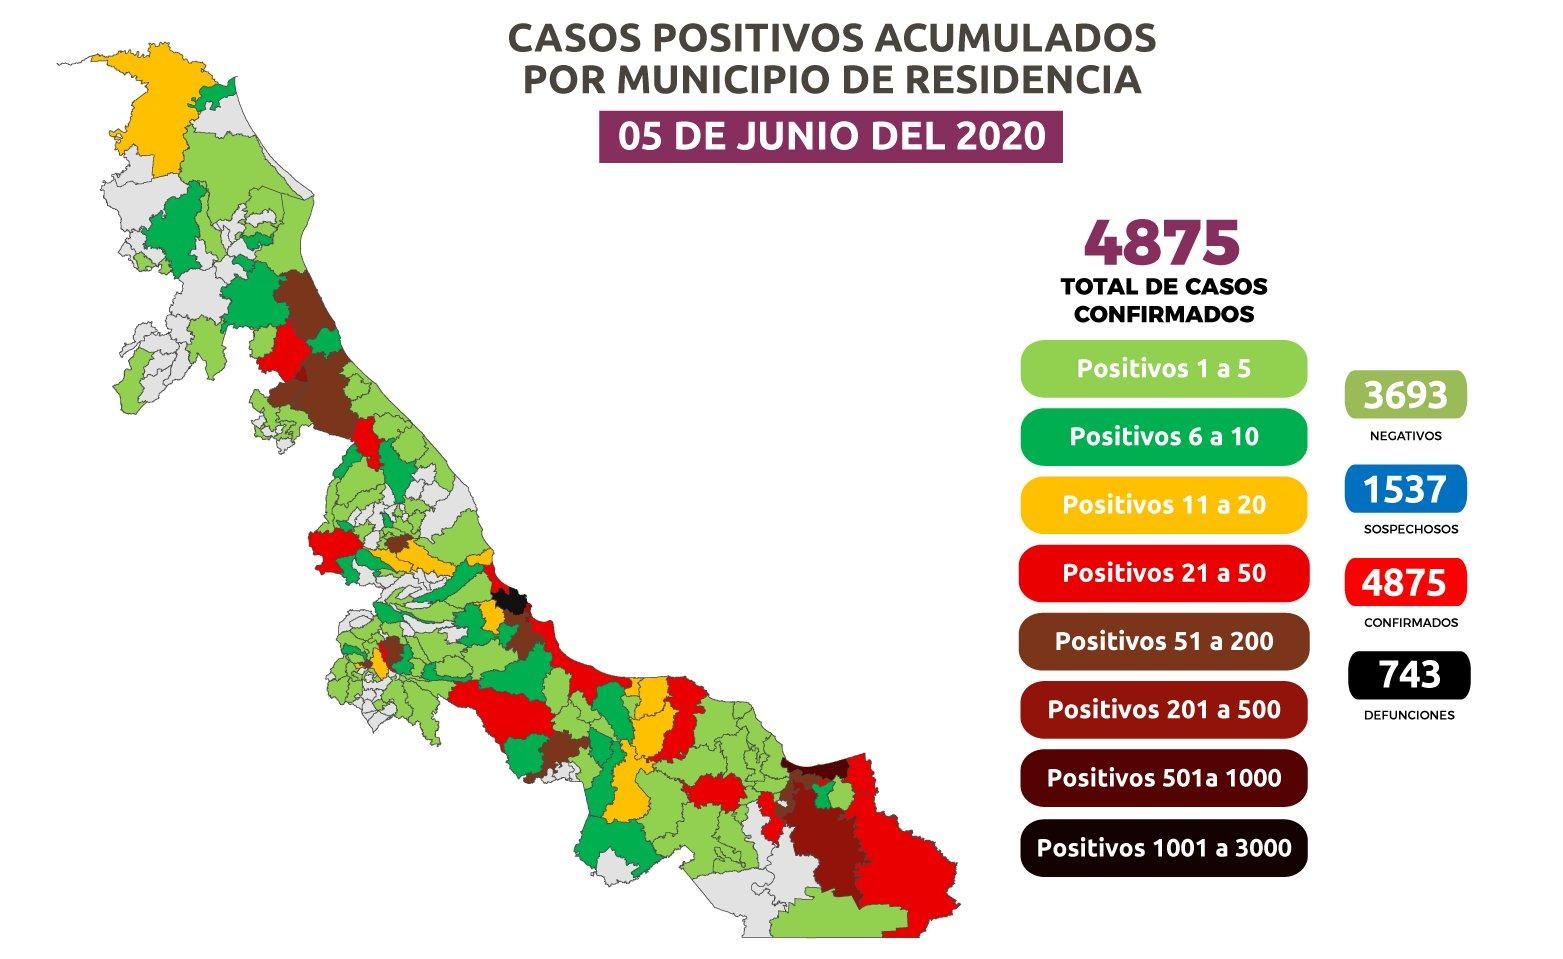 Casos de coronavirus en Veracruz aumentan exponencialmente en un día